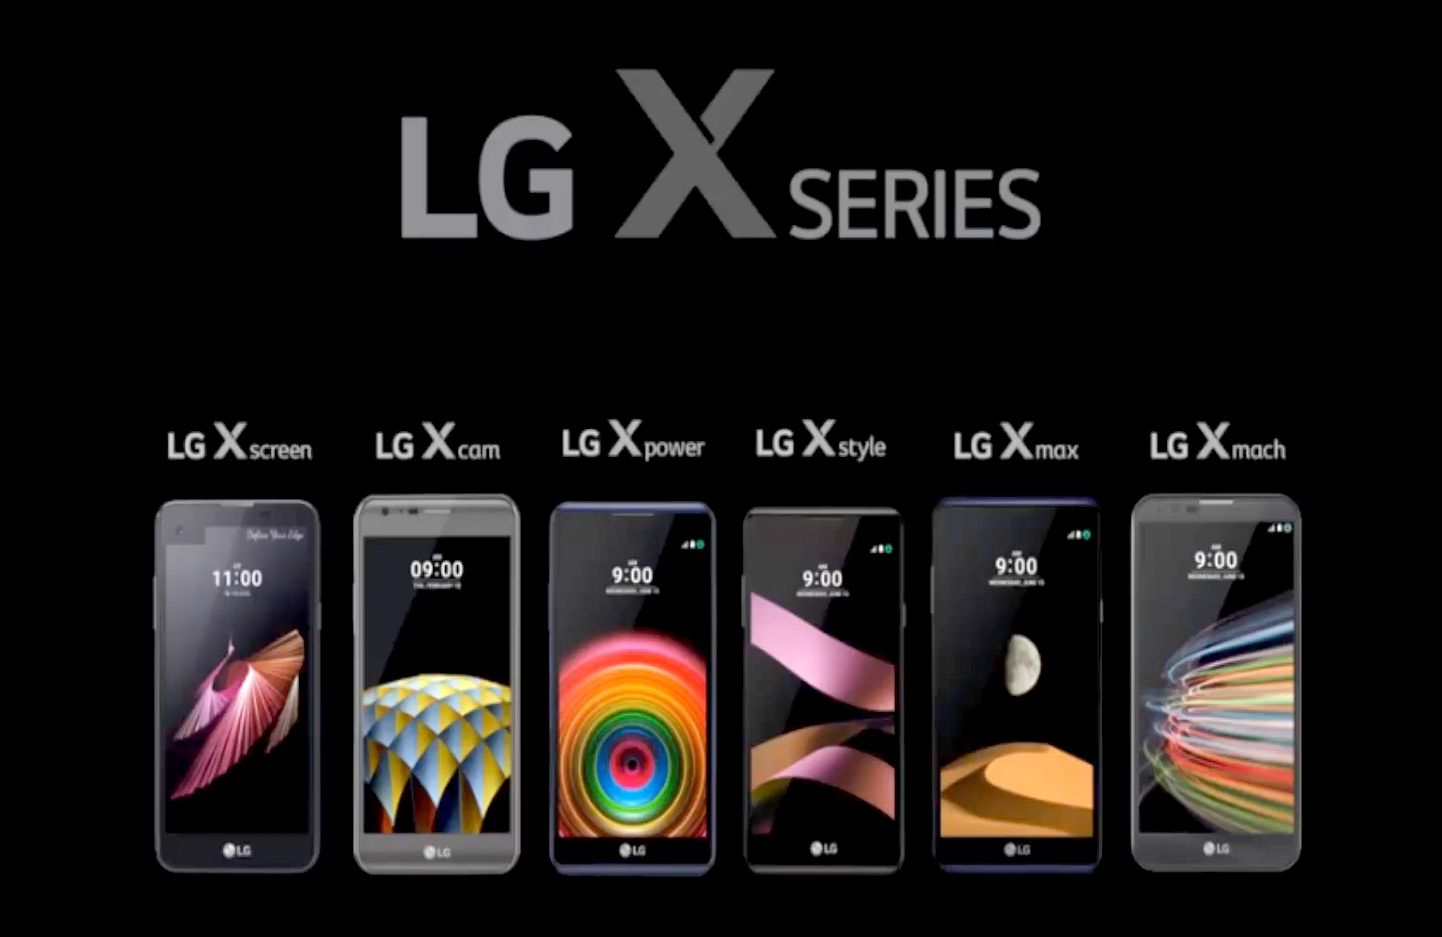 LG UX5 0 for X SERIES | lg x series phones | lg x series